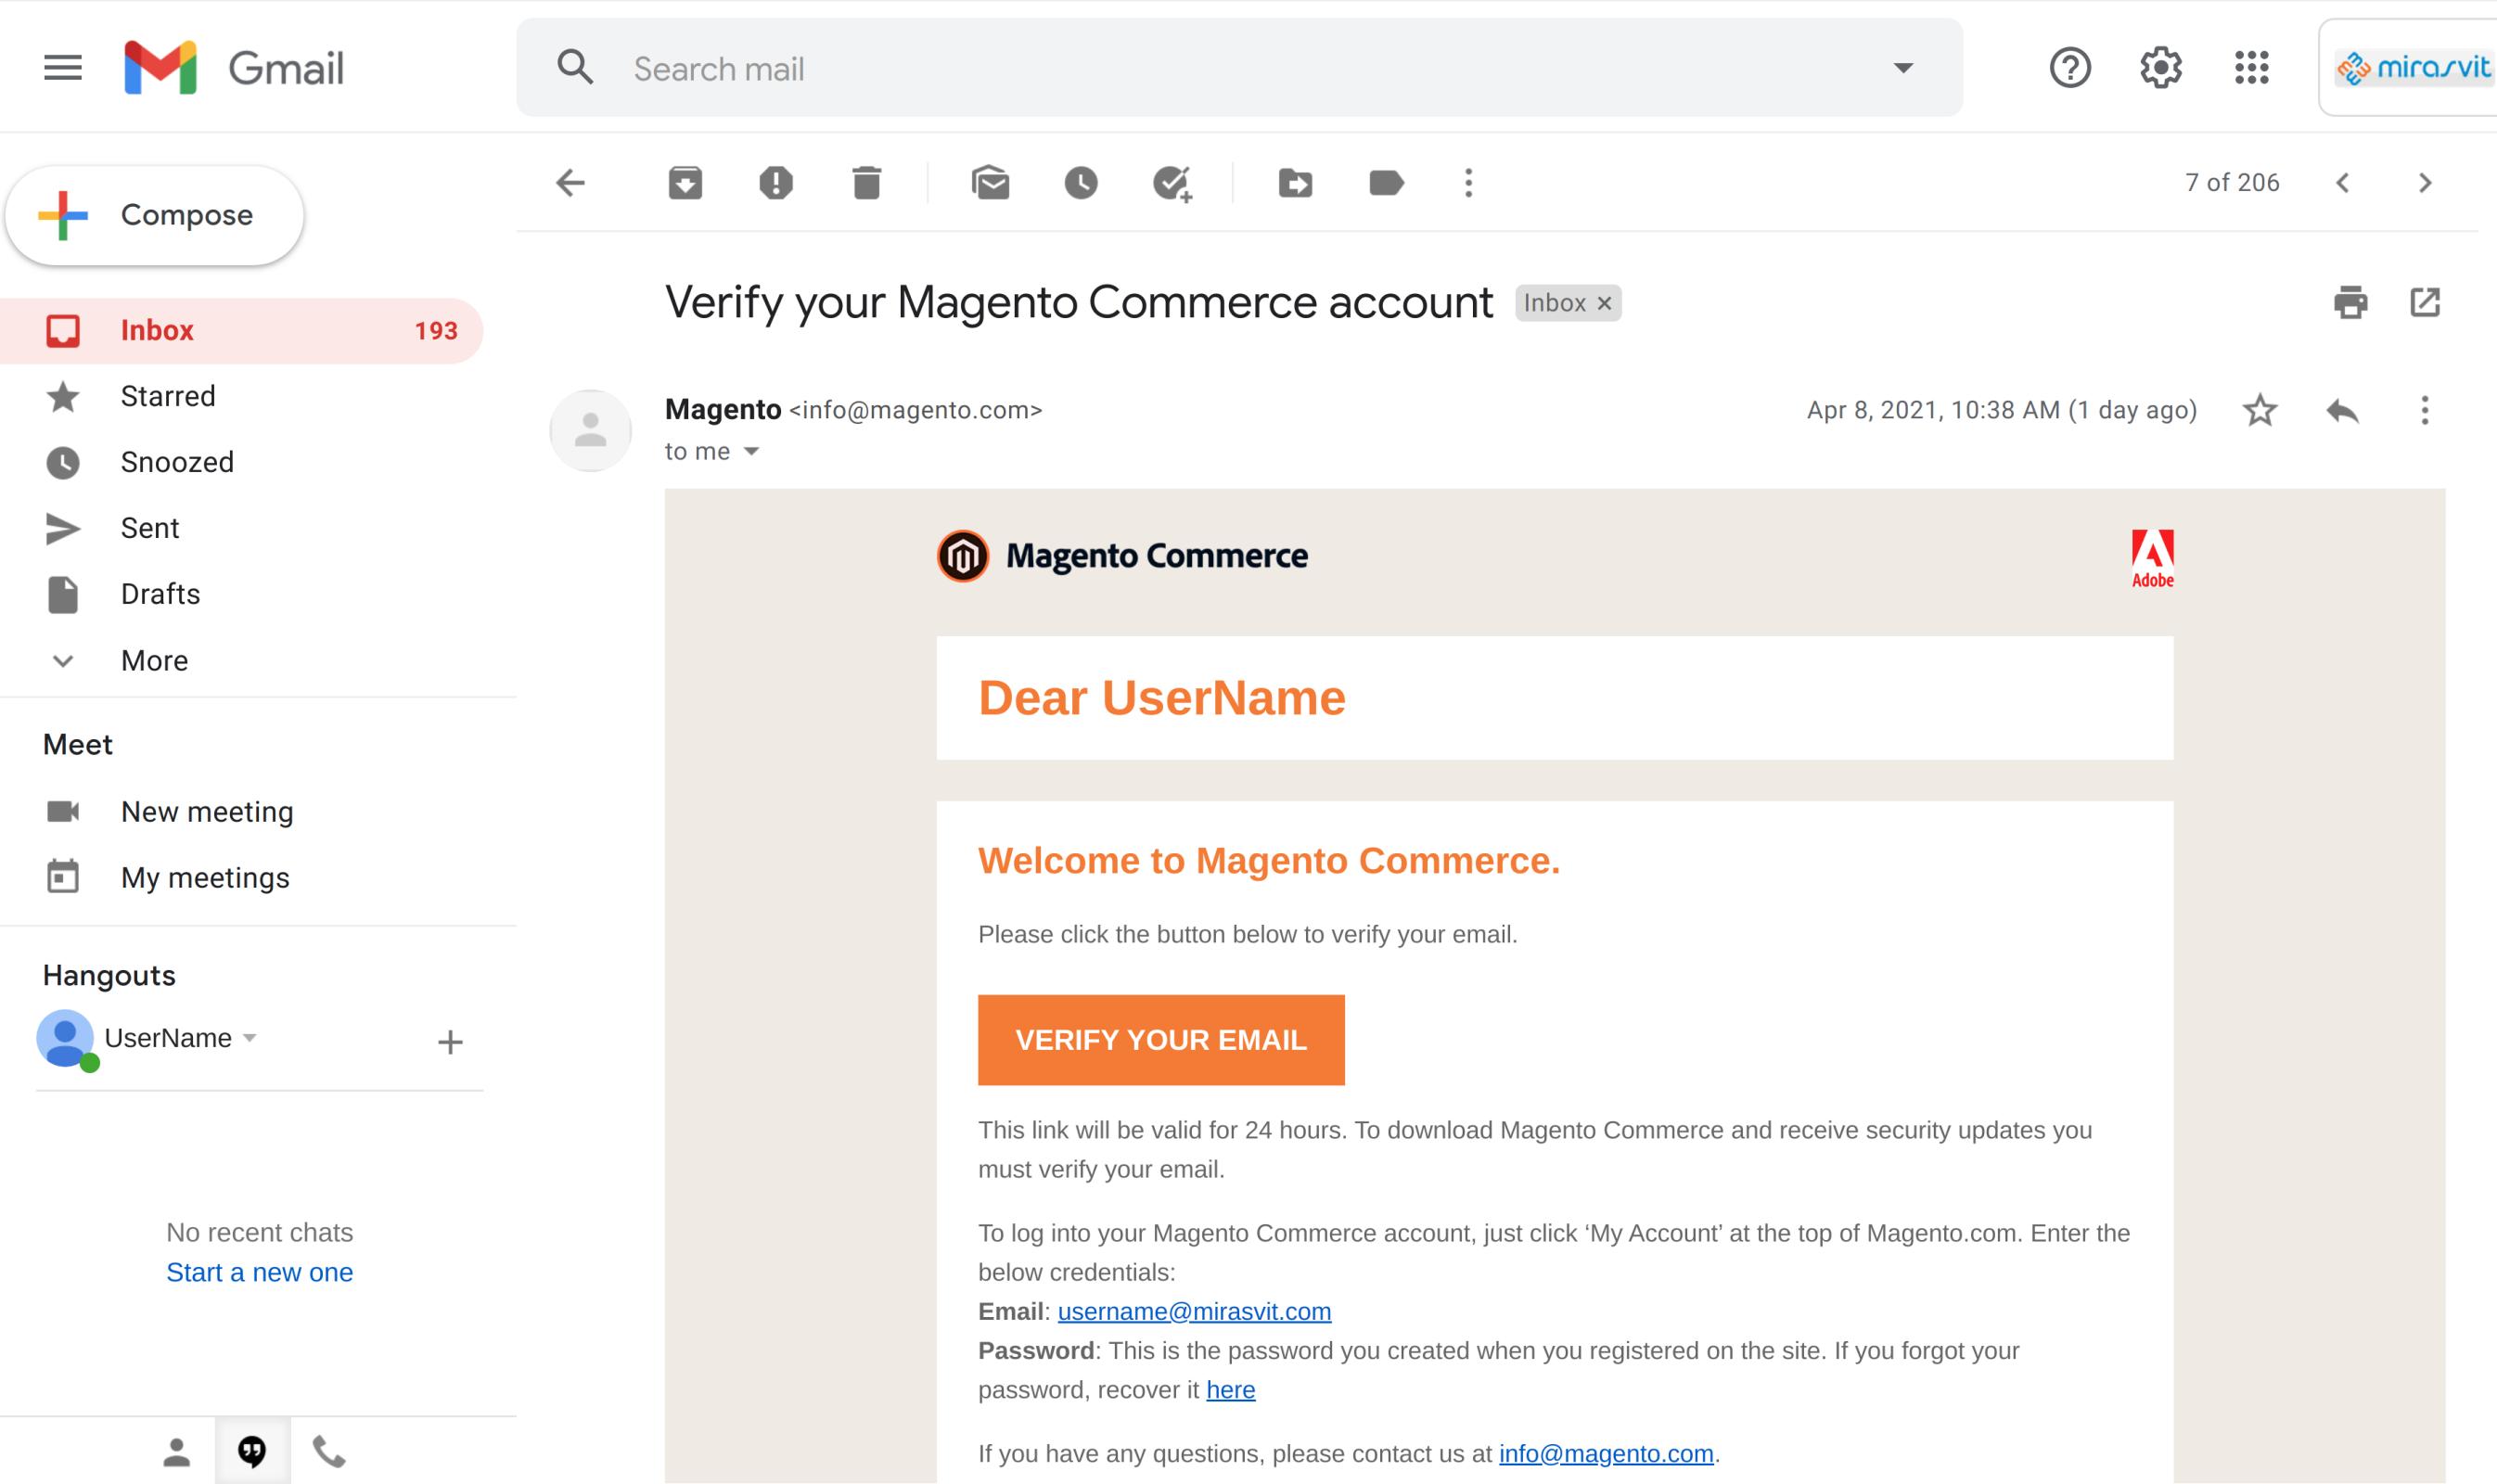 magento-marketplace-verification-letter